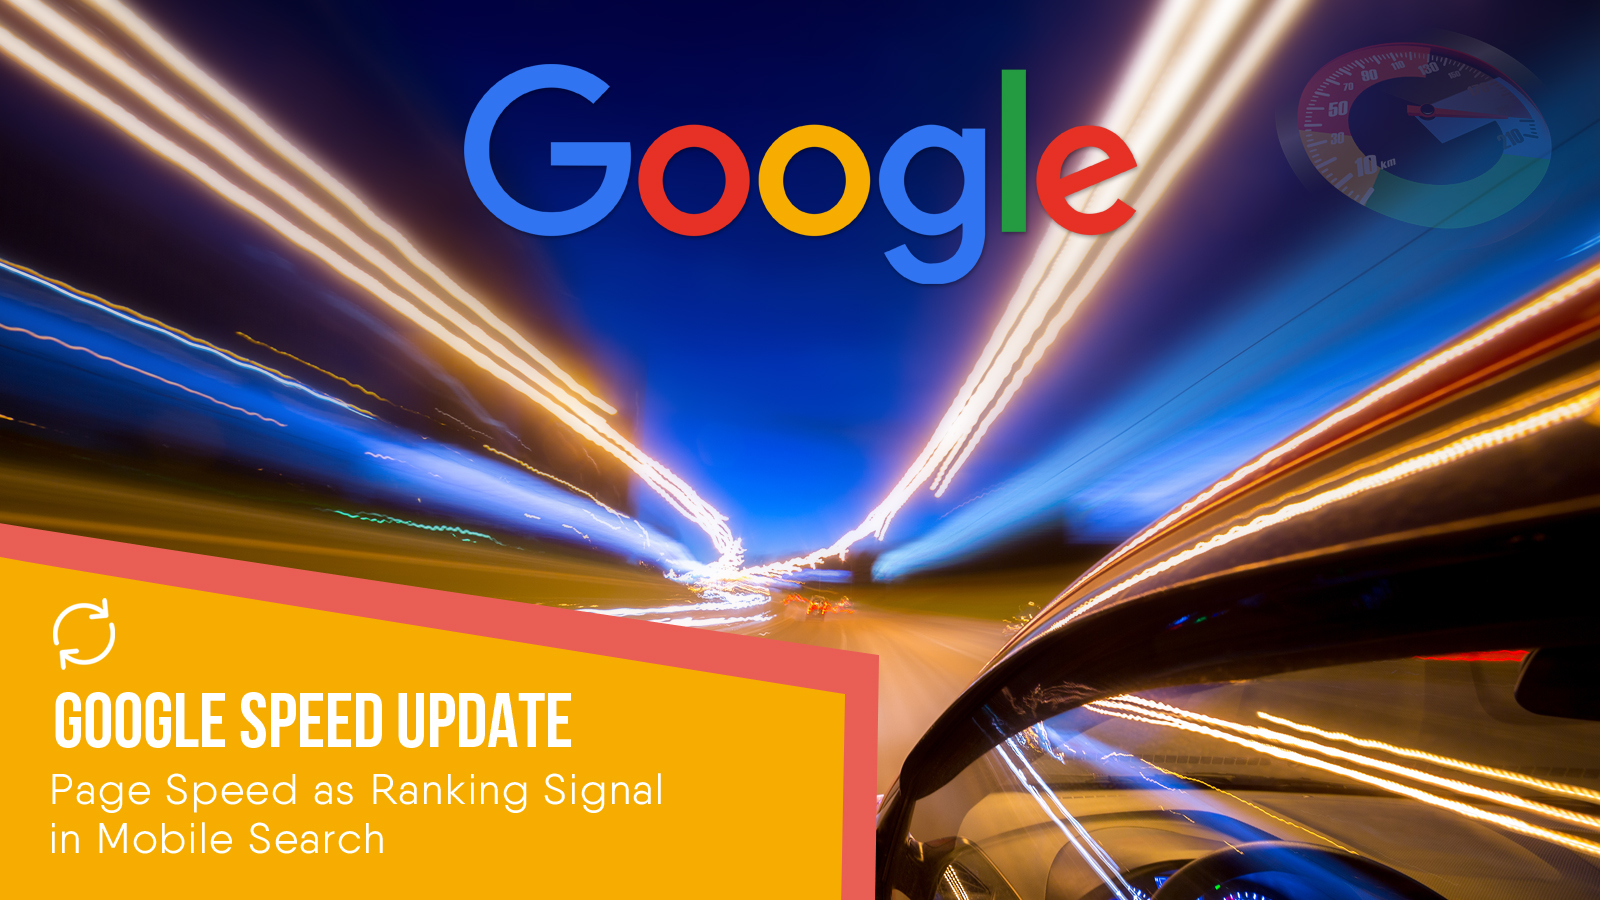 Google Page Speed Update